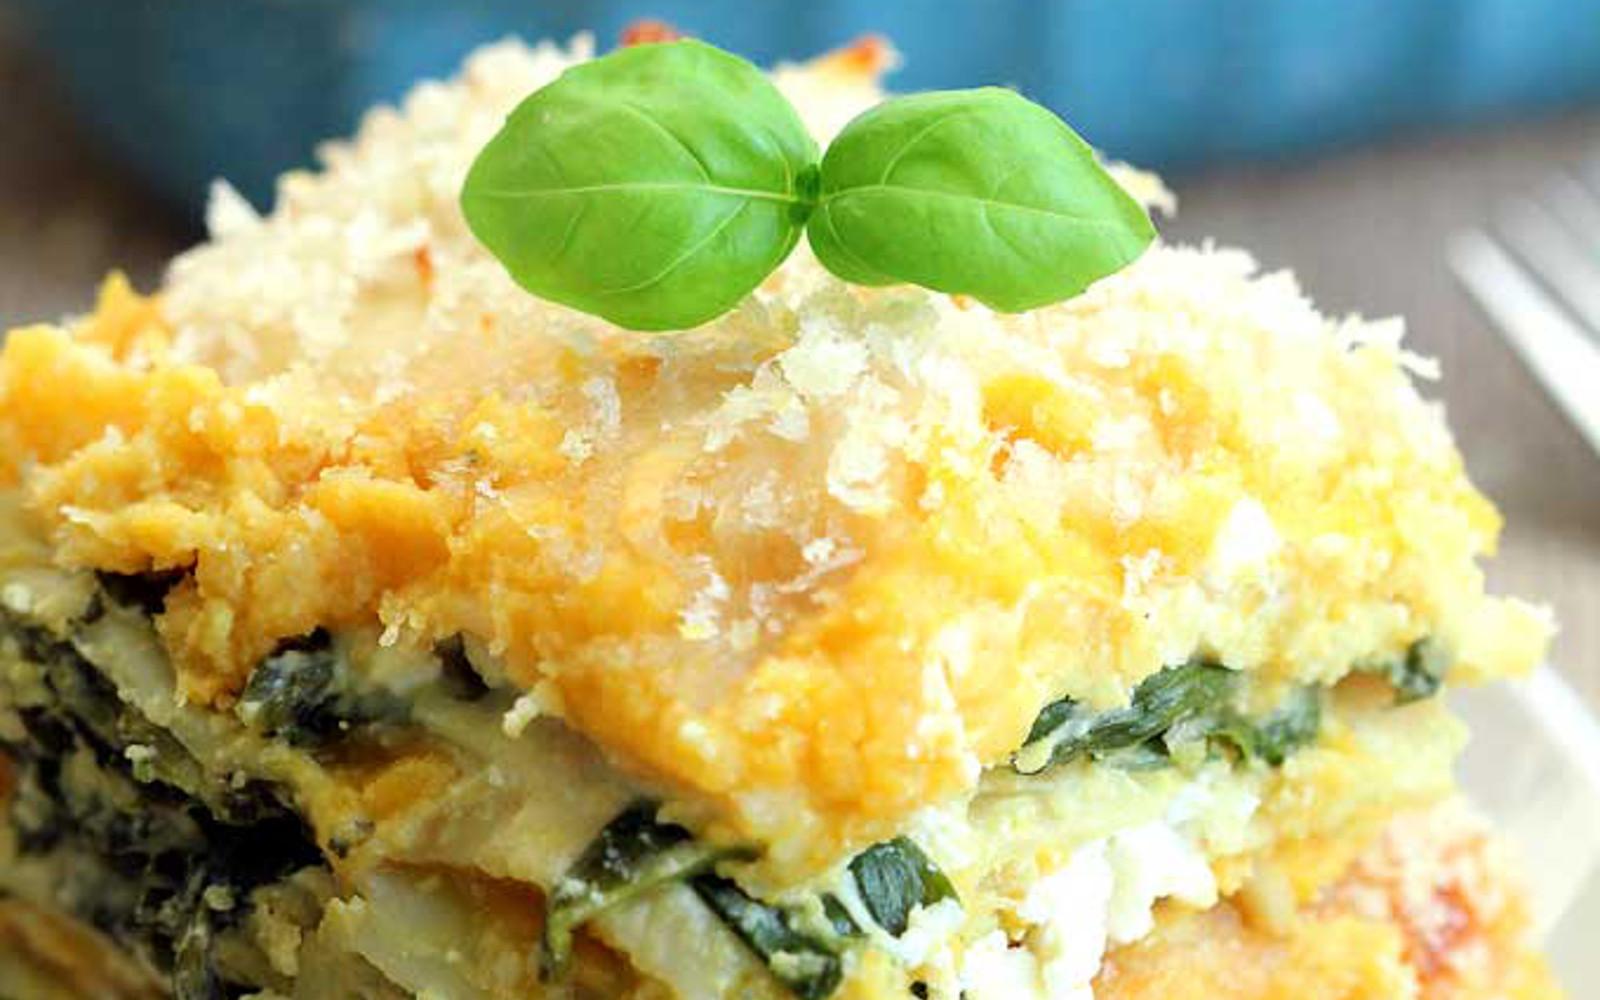 Vegan Squash Recipes  Butternut Squash Lasagna [Vegan] e Green Planet e